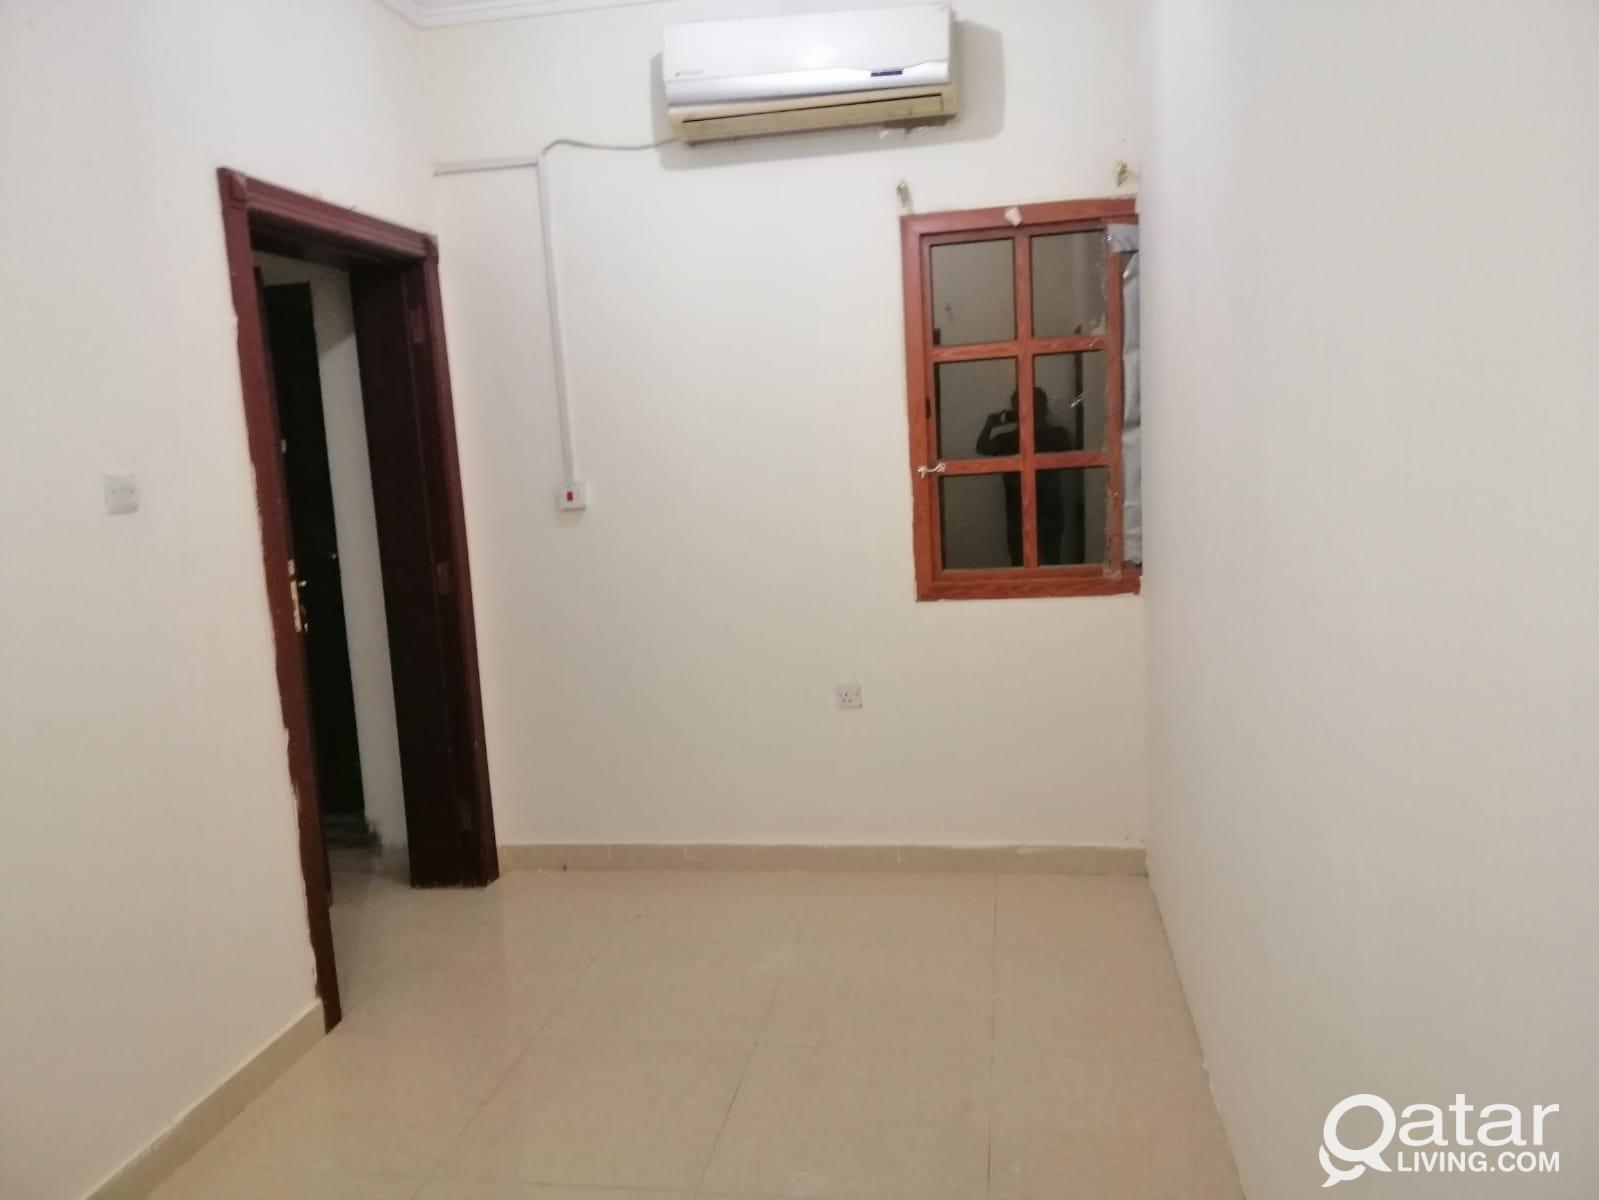 1BHK FAMILY ROOMS IN  AL HILAL